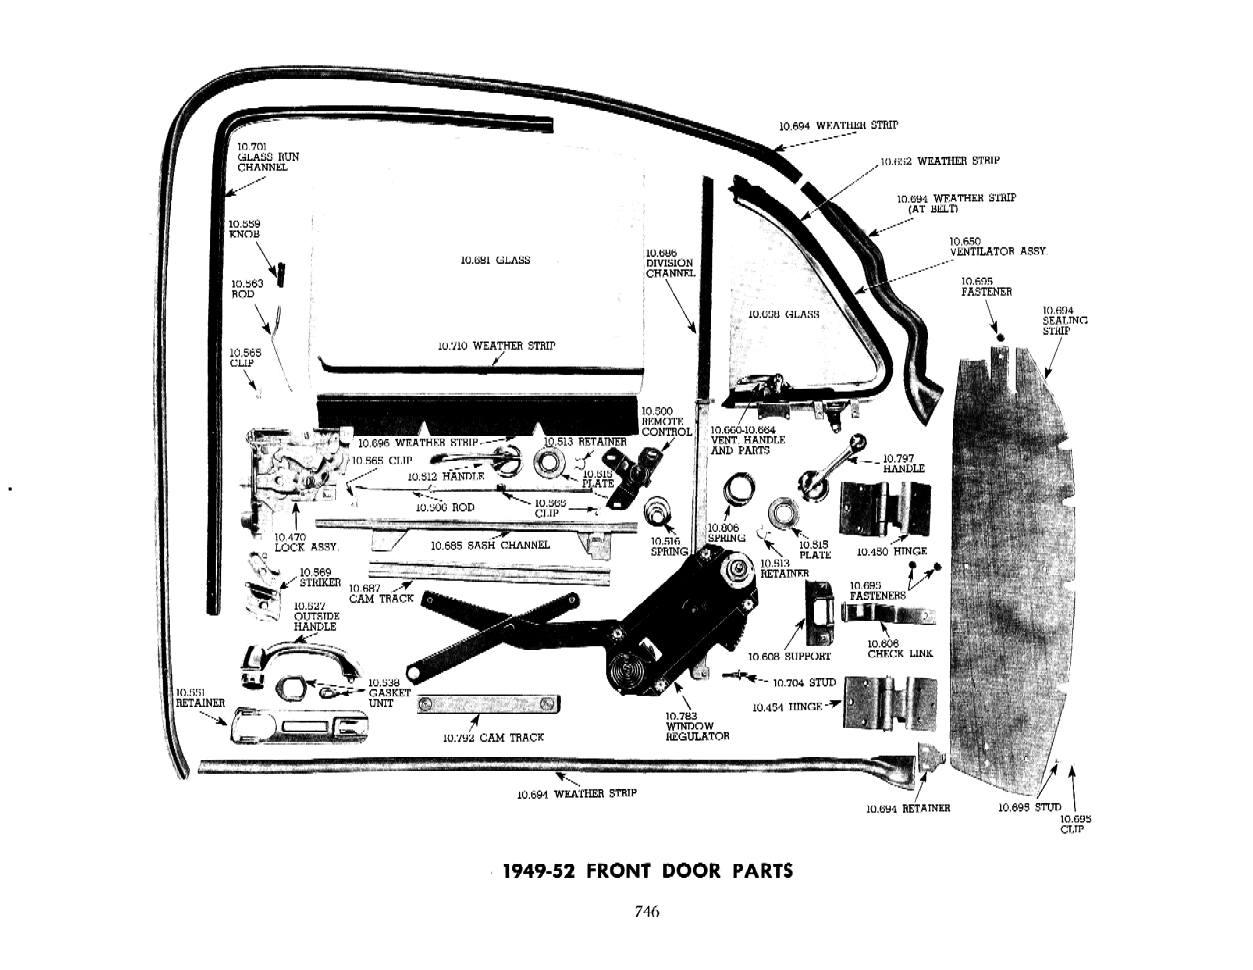 56 bell air wiring diagram ro 6179  1955 chevy bel air parts catalog  ro 6179  1955 chevy bel air parts catalog